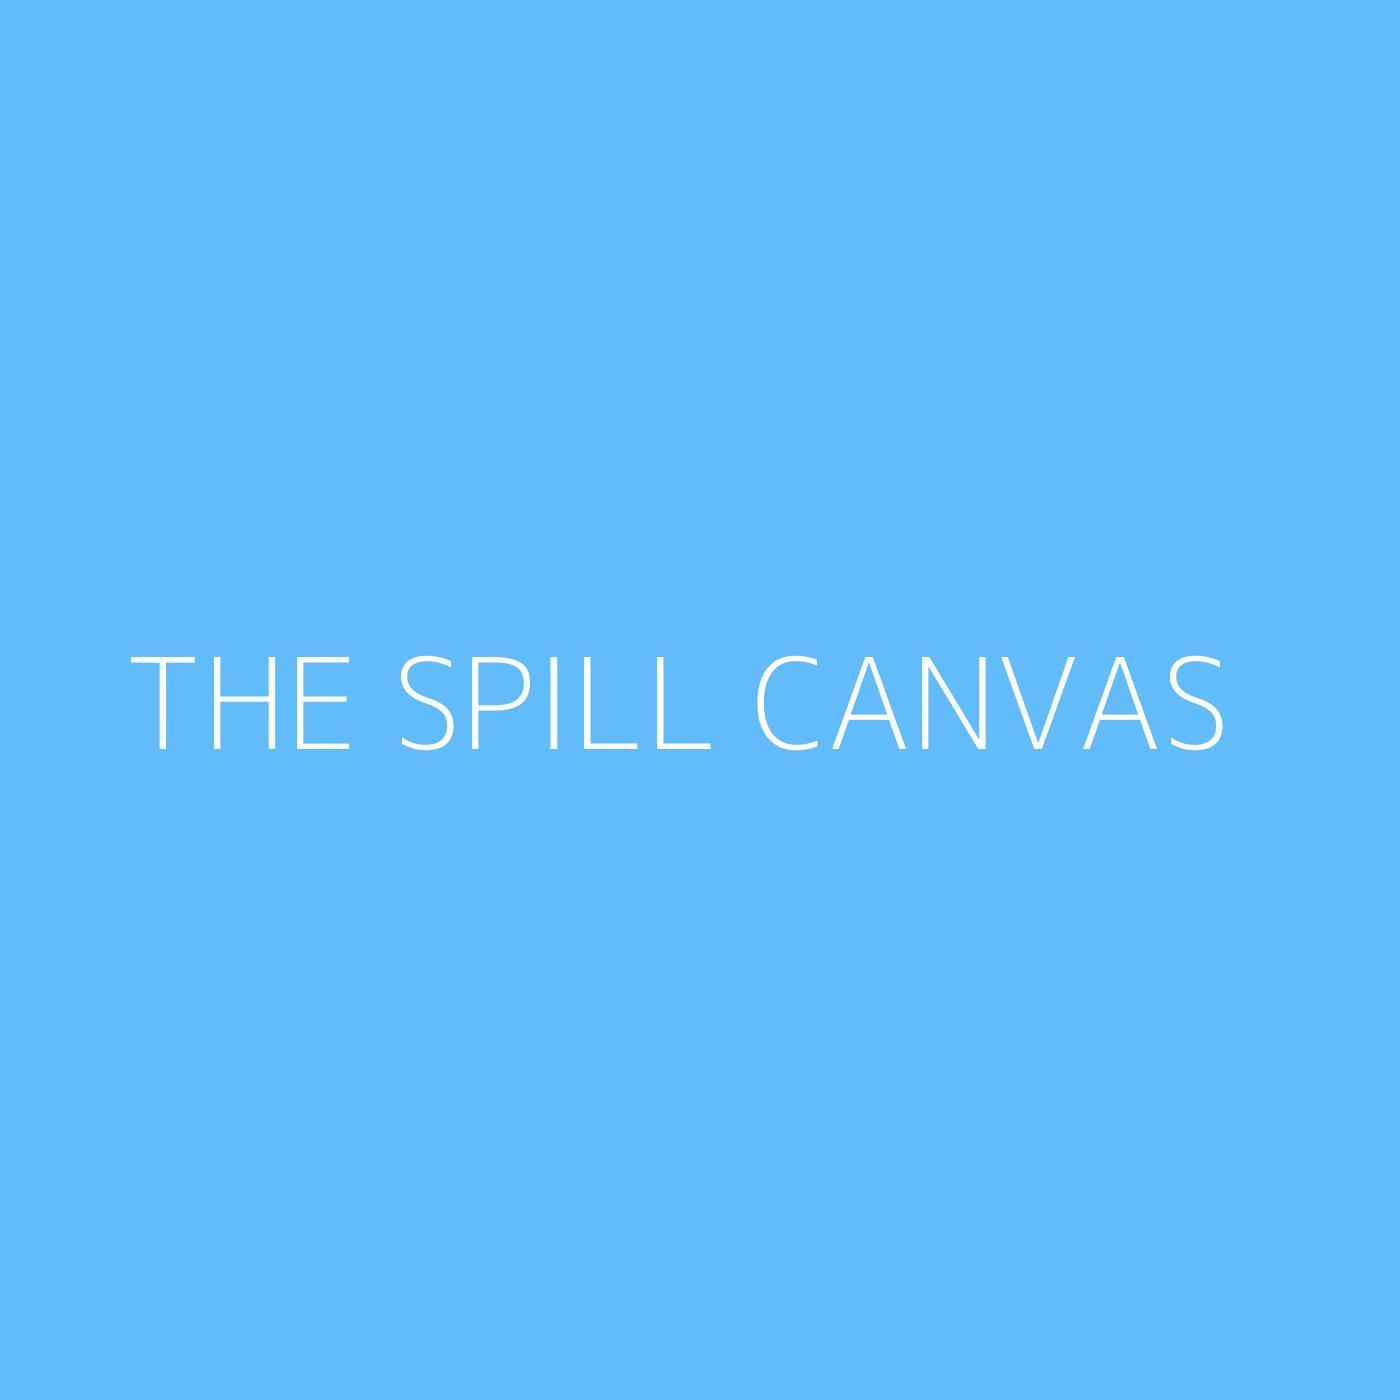 The Spill Canvas Playlist Artwork